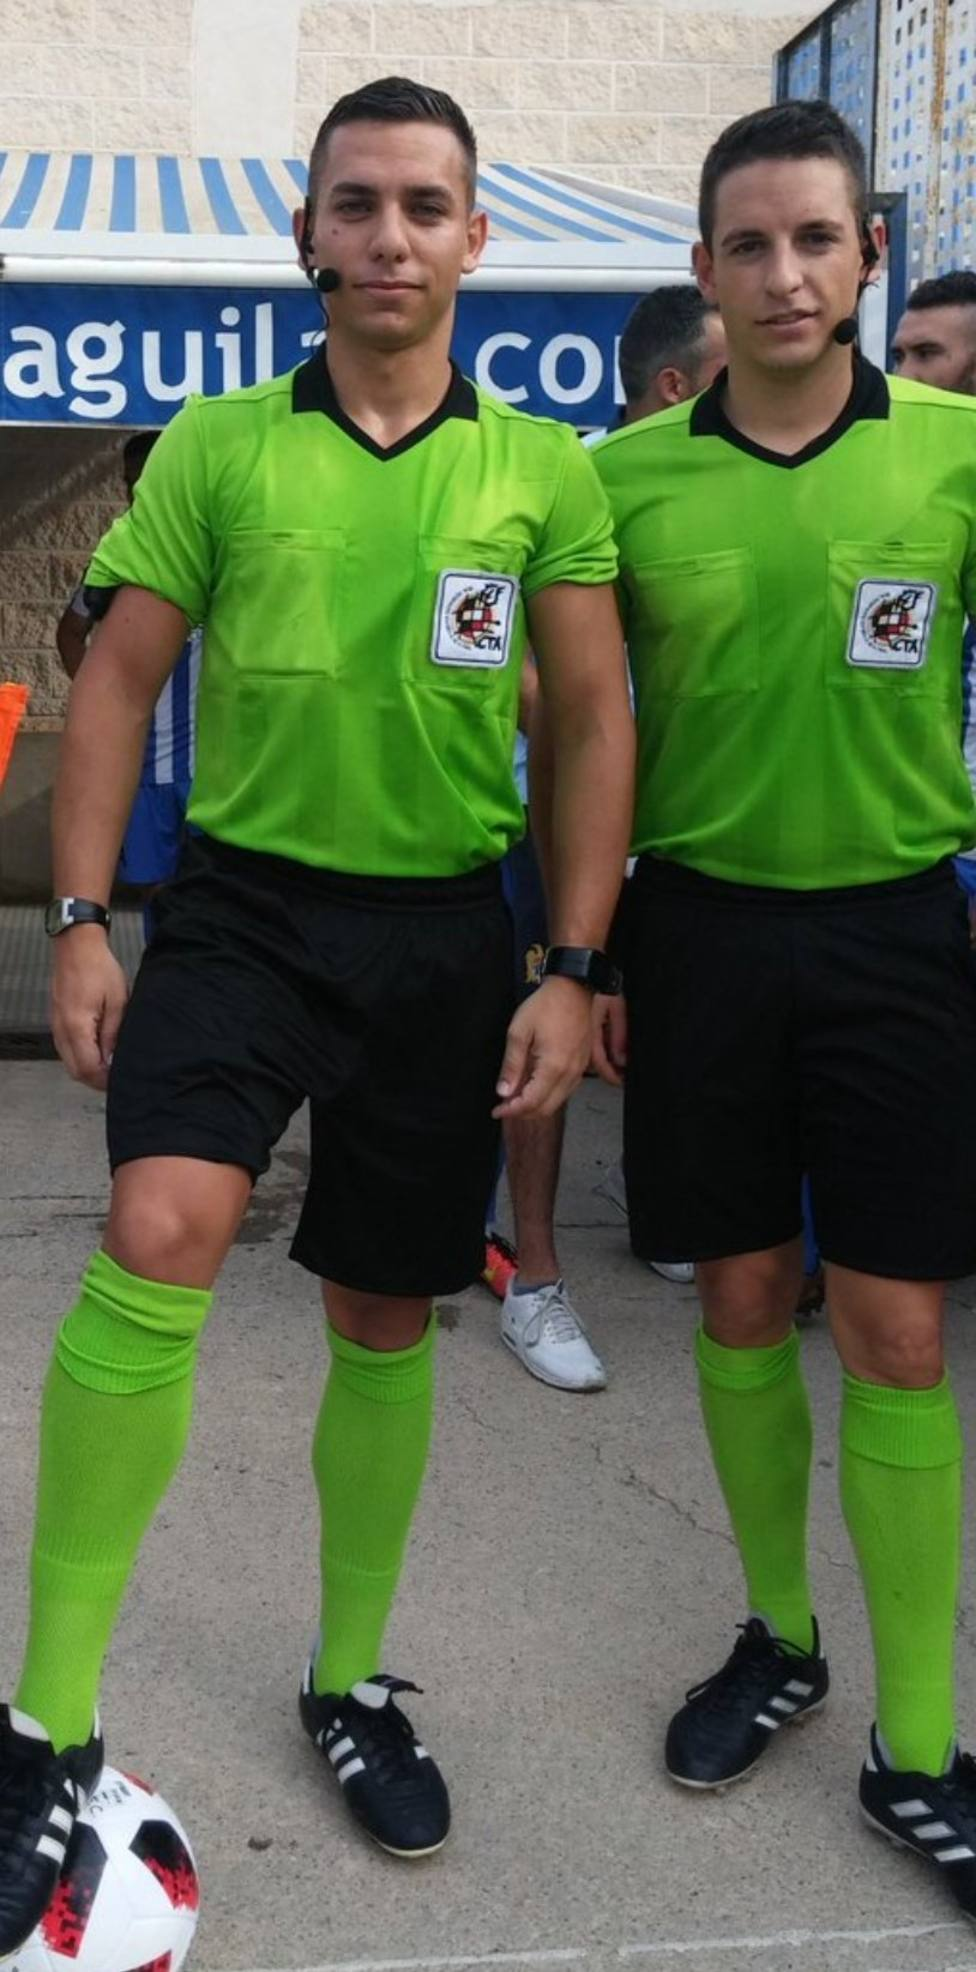 El aguileño Martínez Montalbán asciende a Primera RFEF